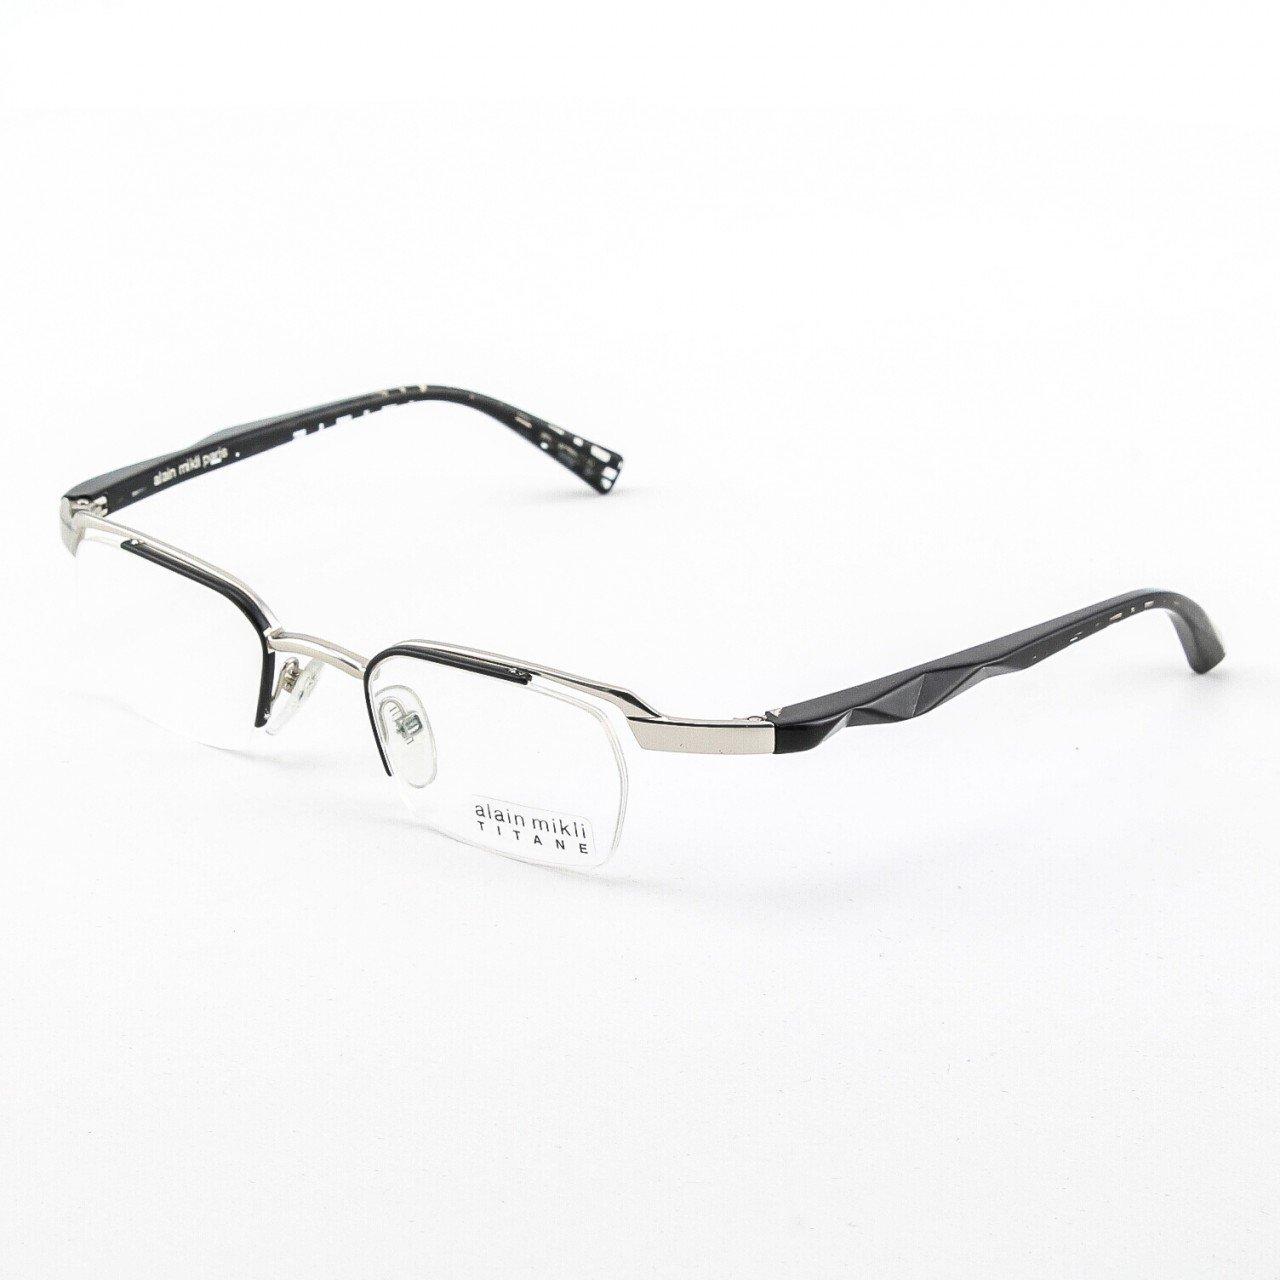 Alain Mikli Eyeglasses AL0556 Col. 8 Silver and Black Frame with Black Geometric Temples